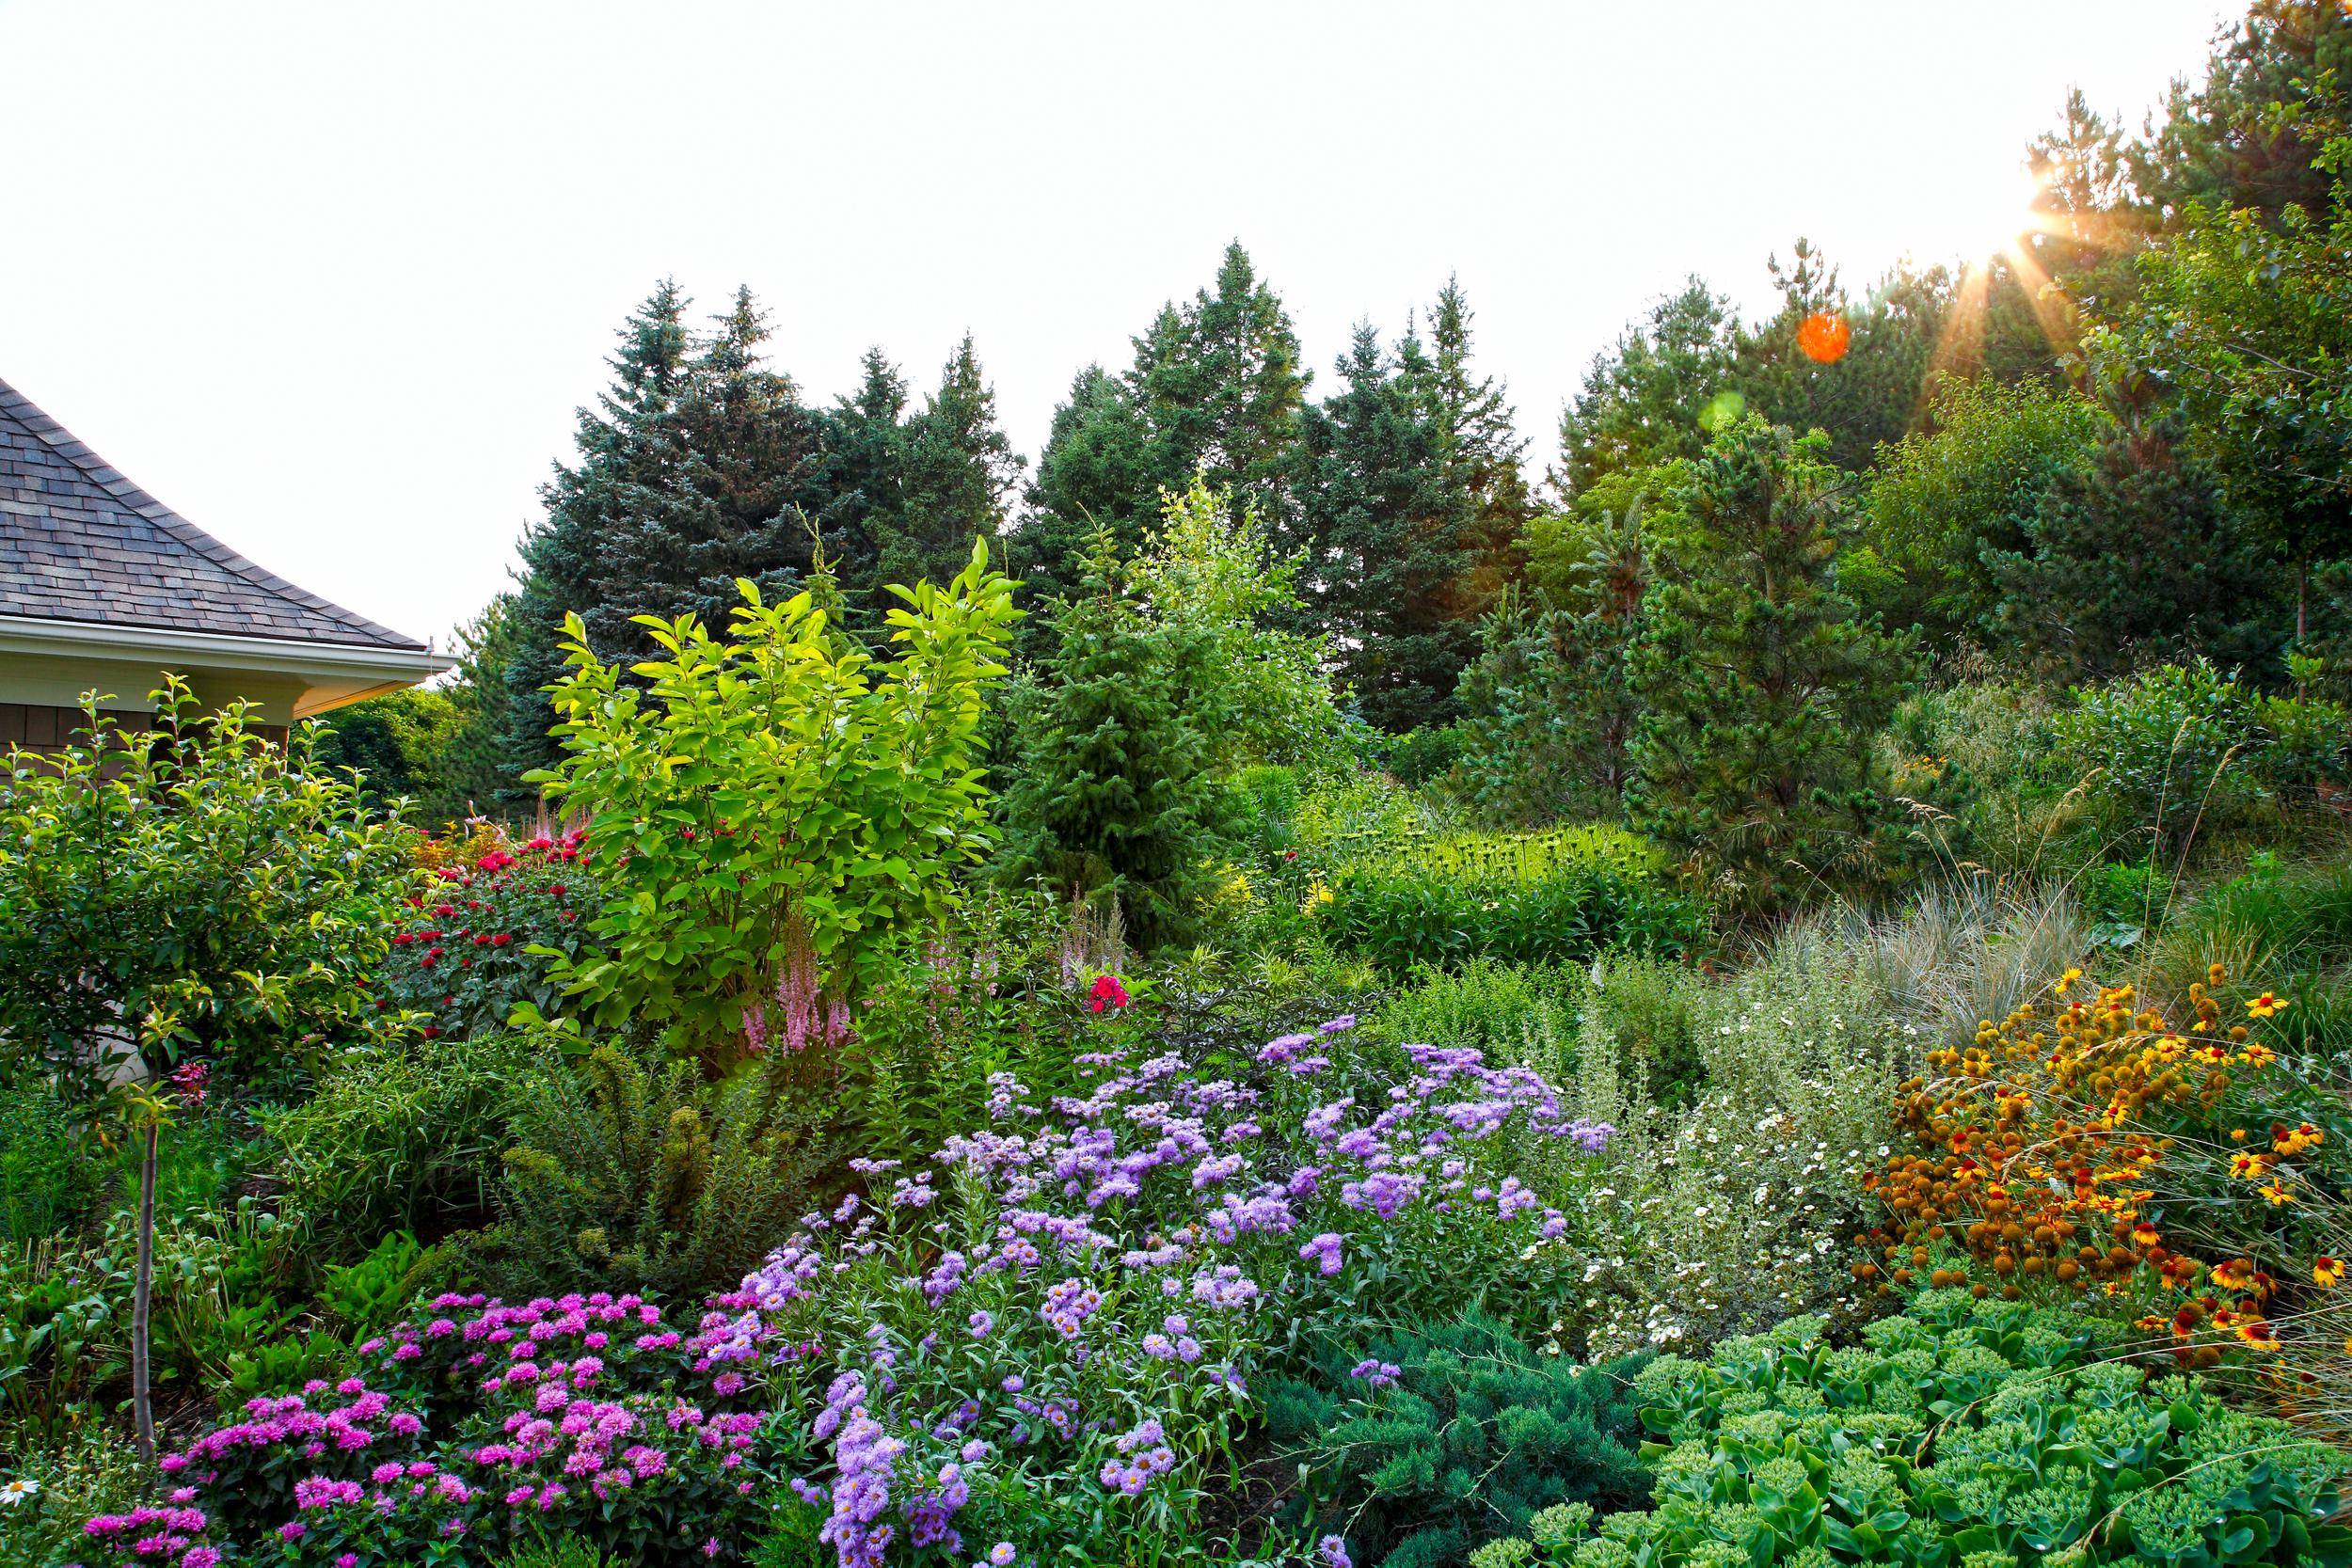 W21B._MG_1964 Rosen garden ls.jpg